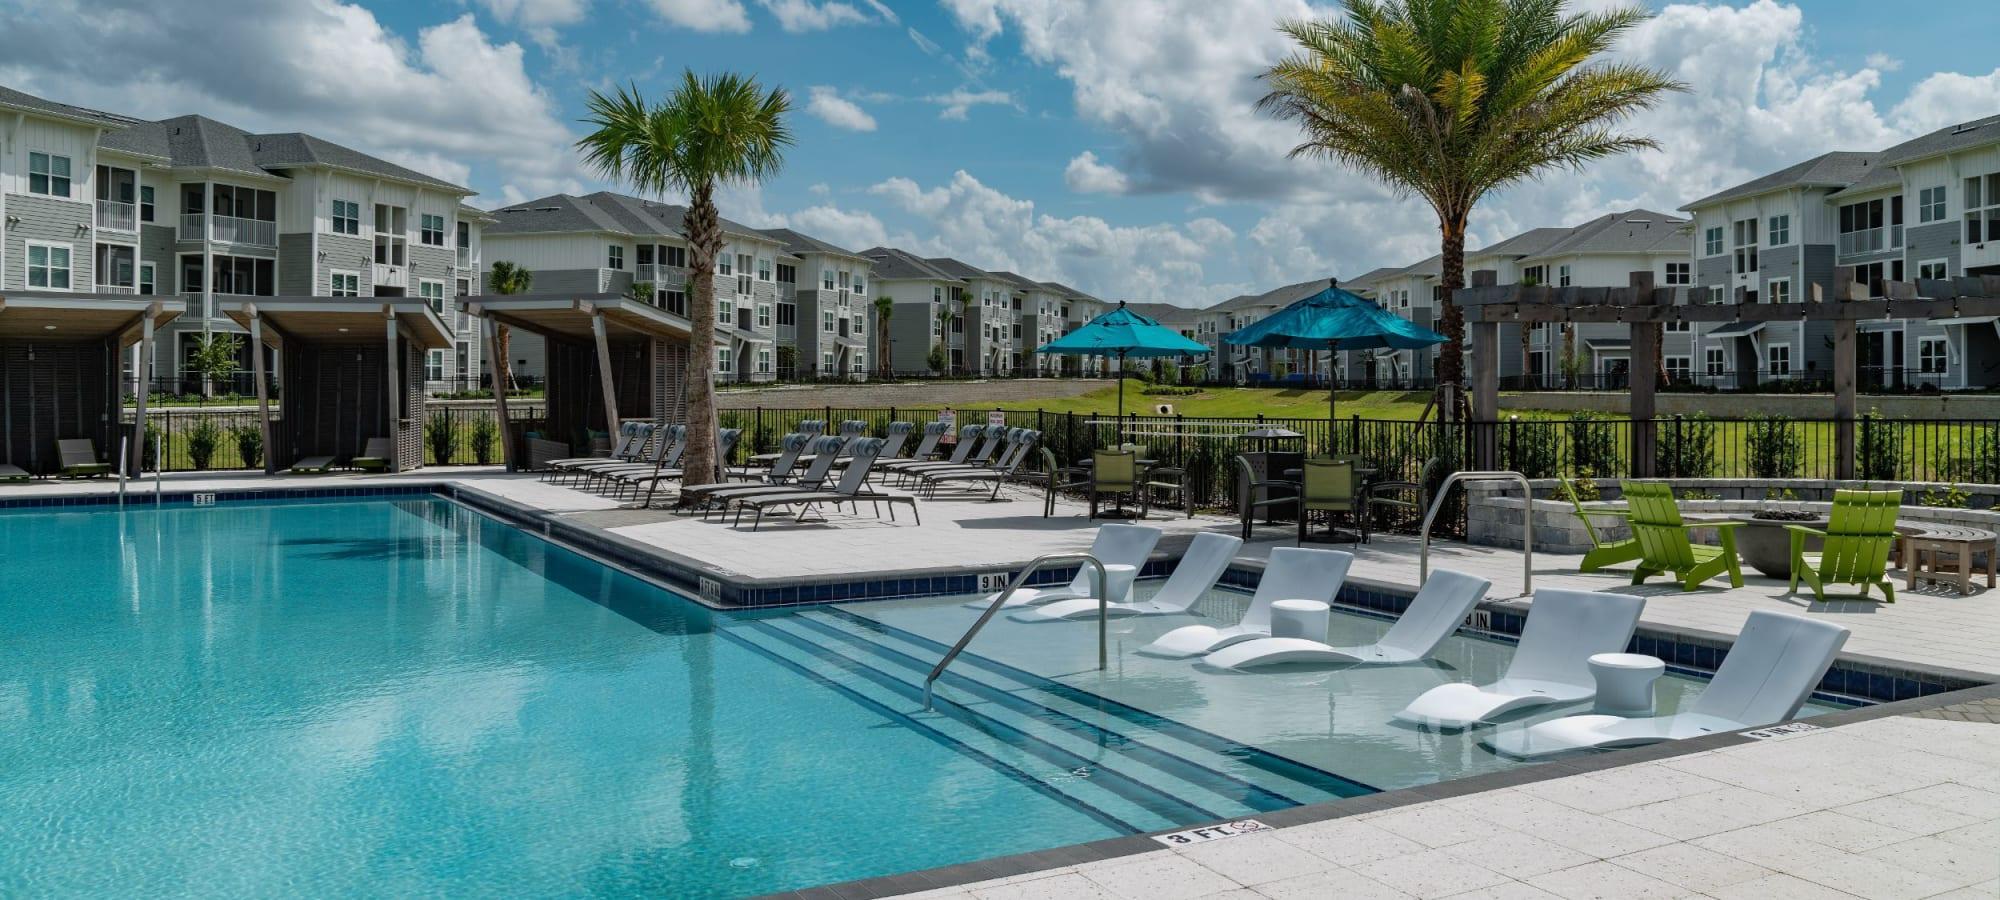 Apartments at Reunion at 400 in Kissimmee, Florida